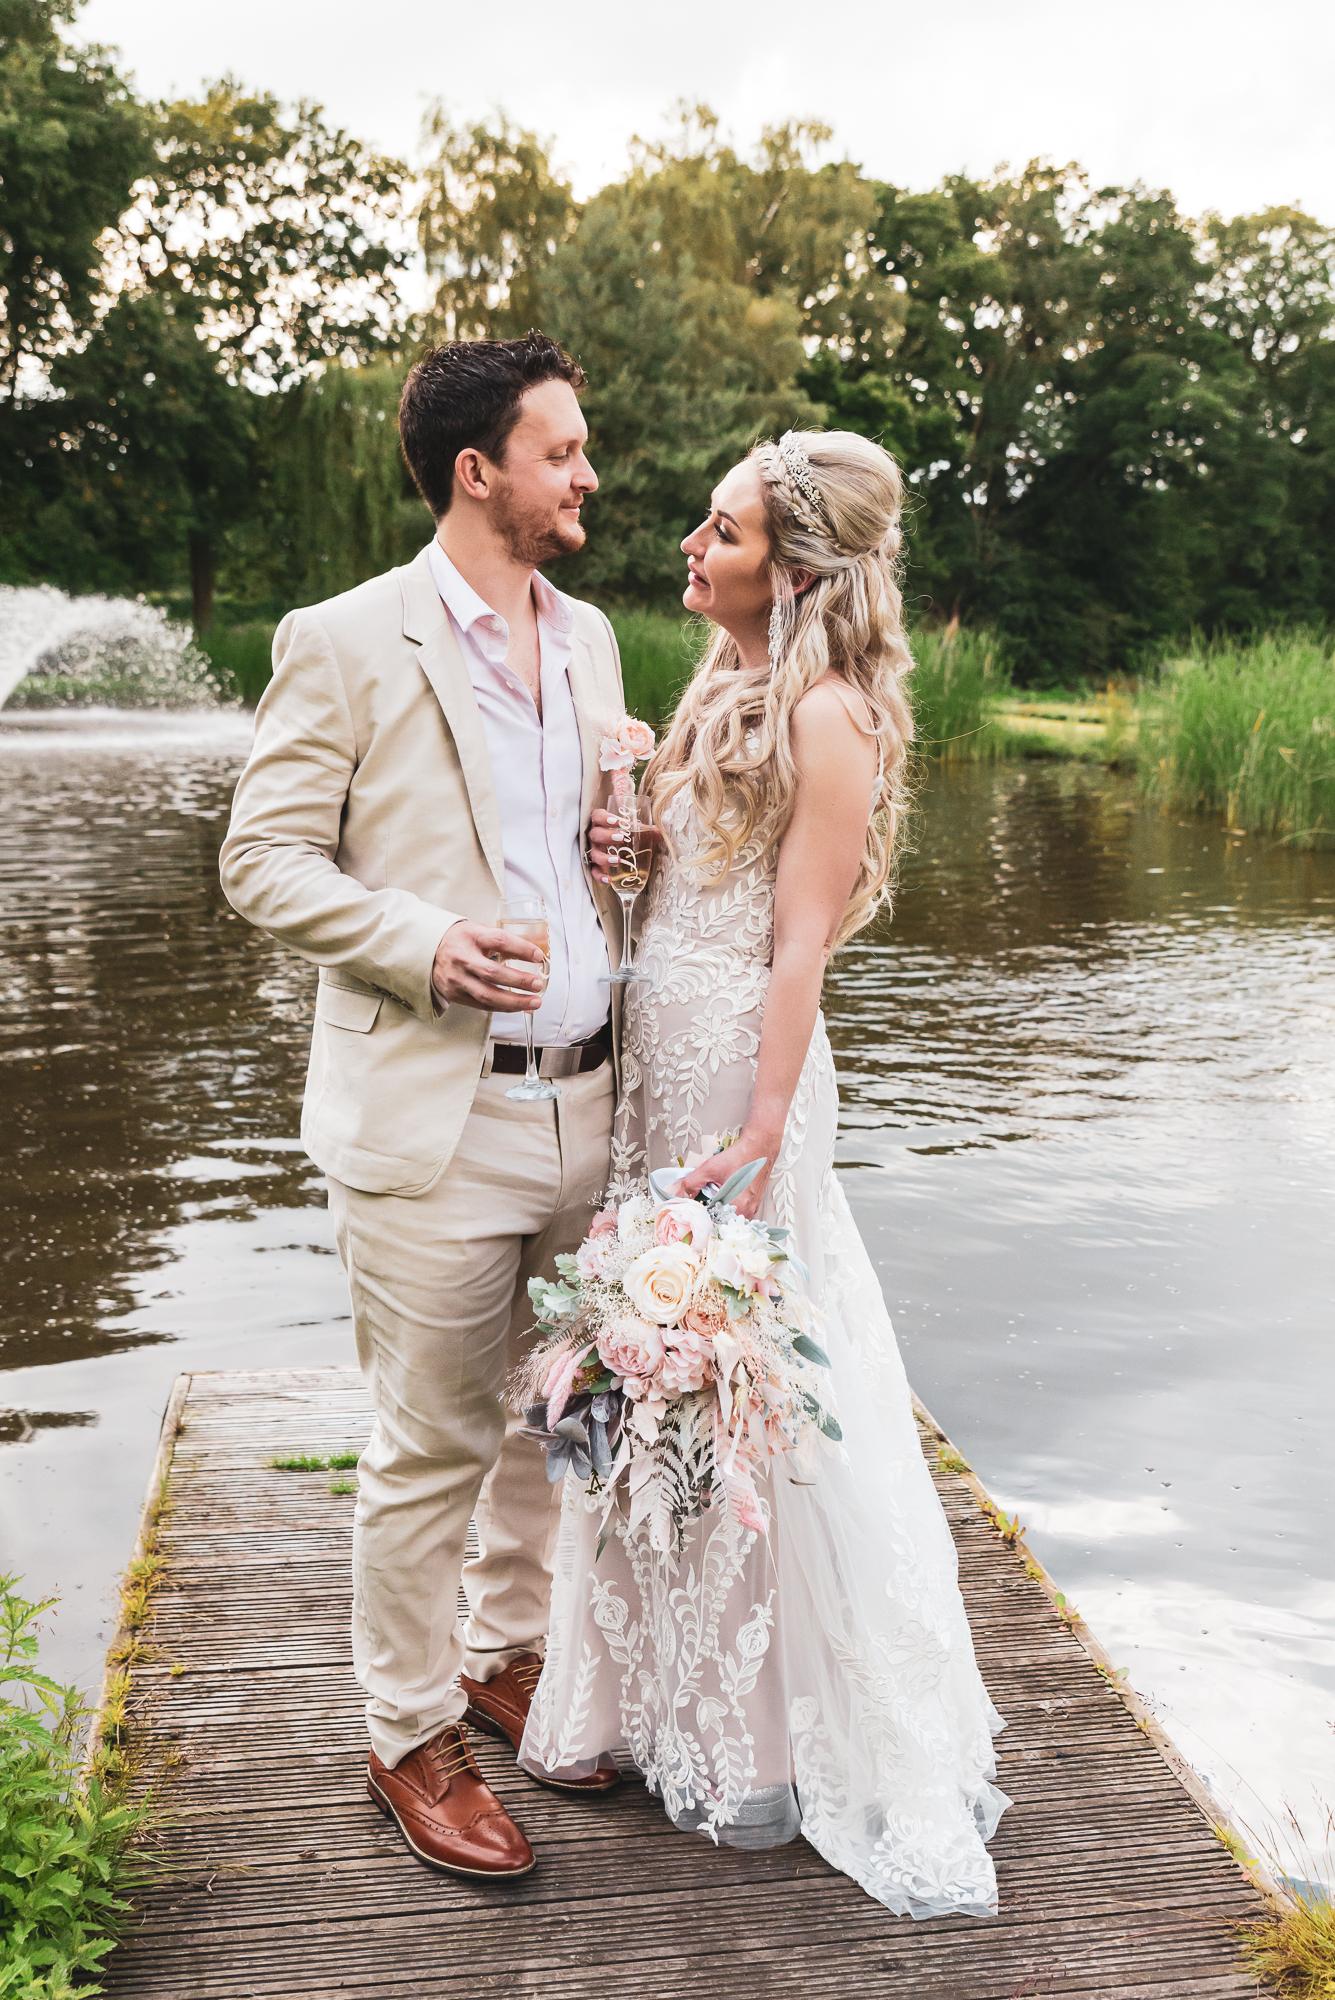 The Love Shack wedding photography